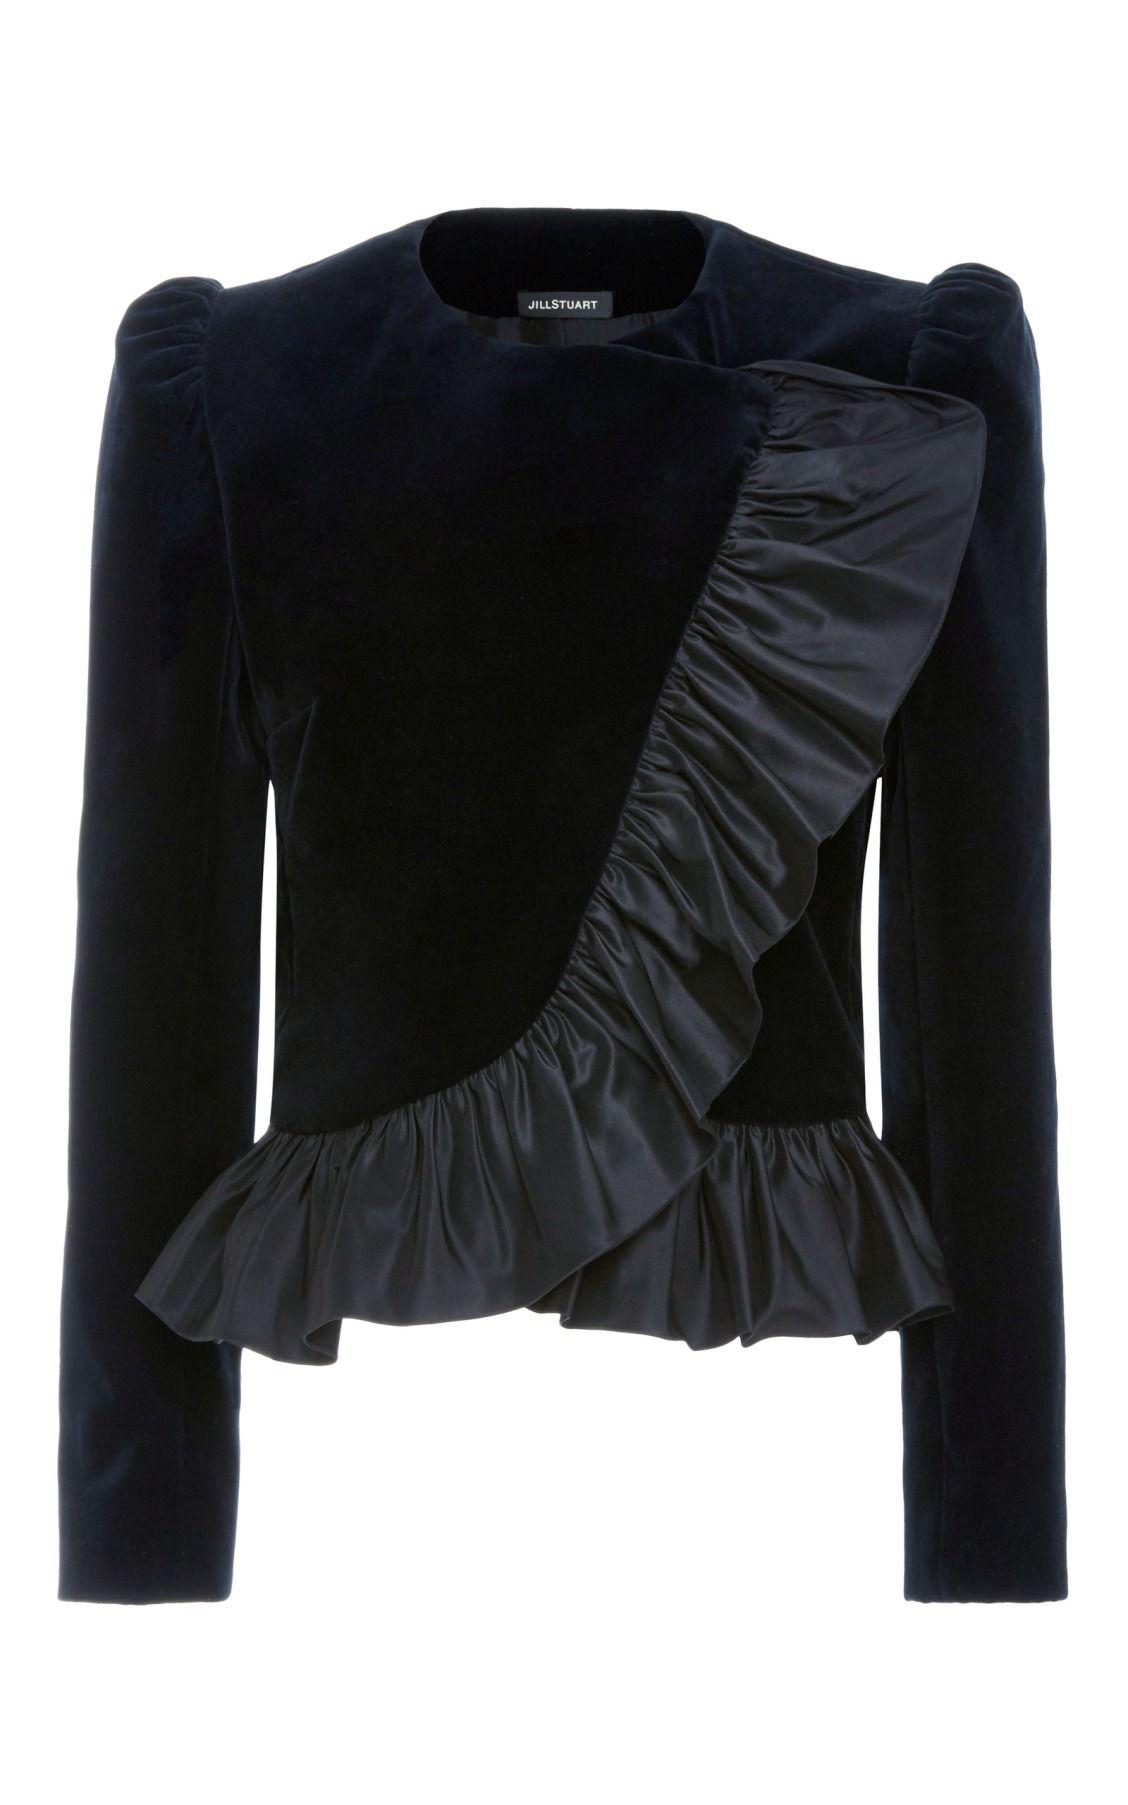 Maxine Ruffle Jacket by Jill Stuart